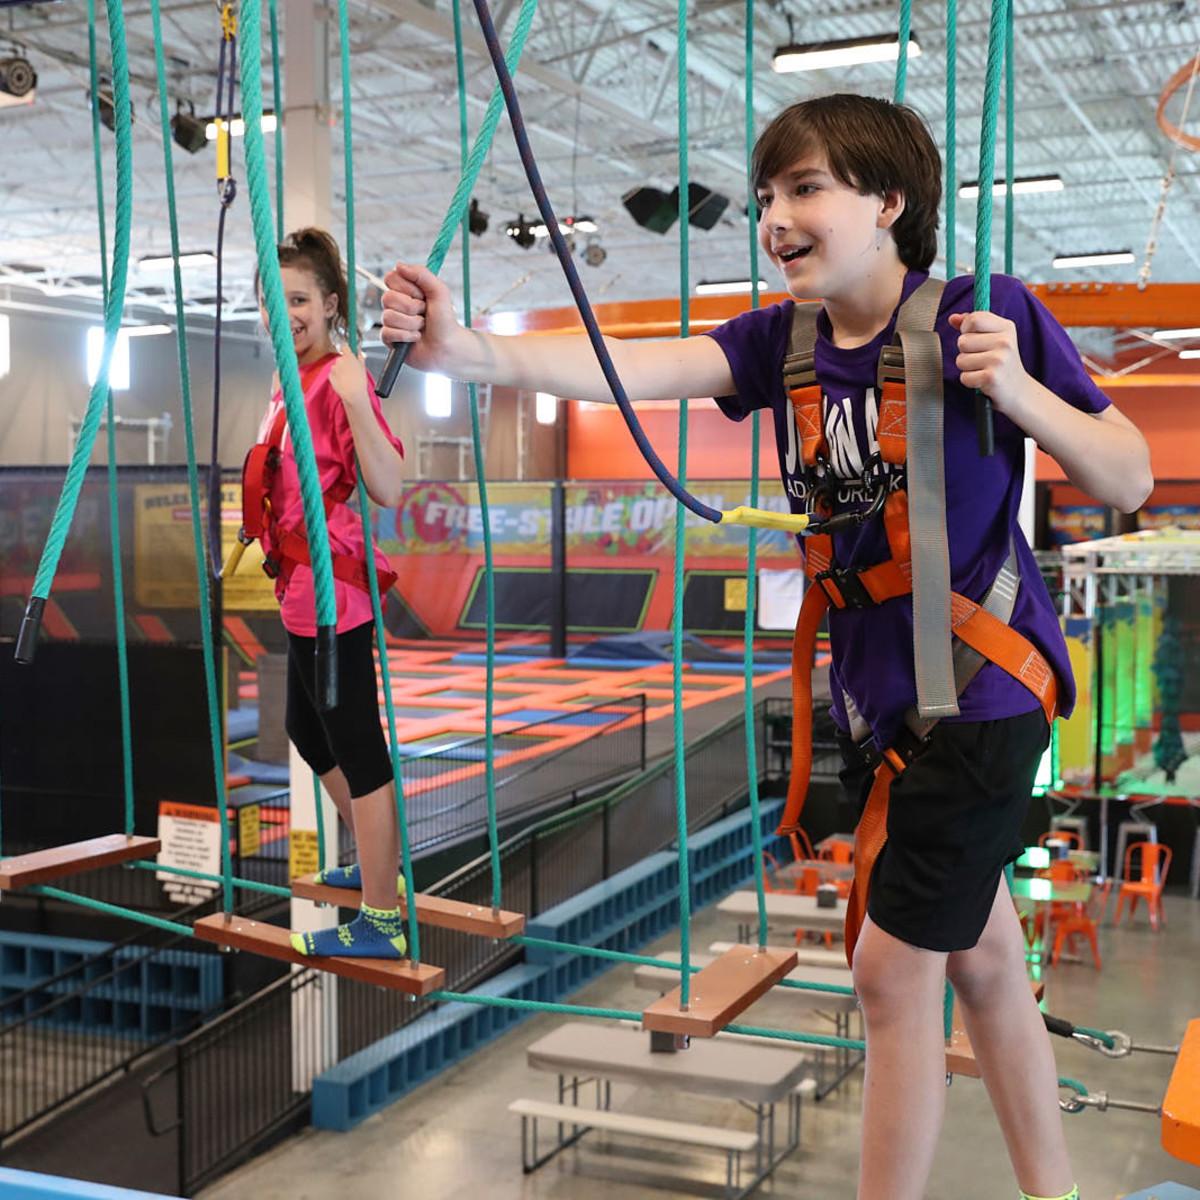 Urban Air Adventure Park ropes course